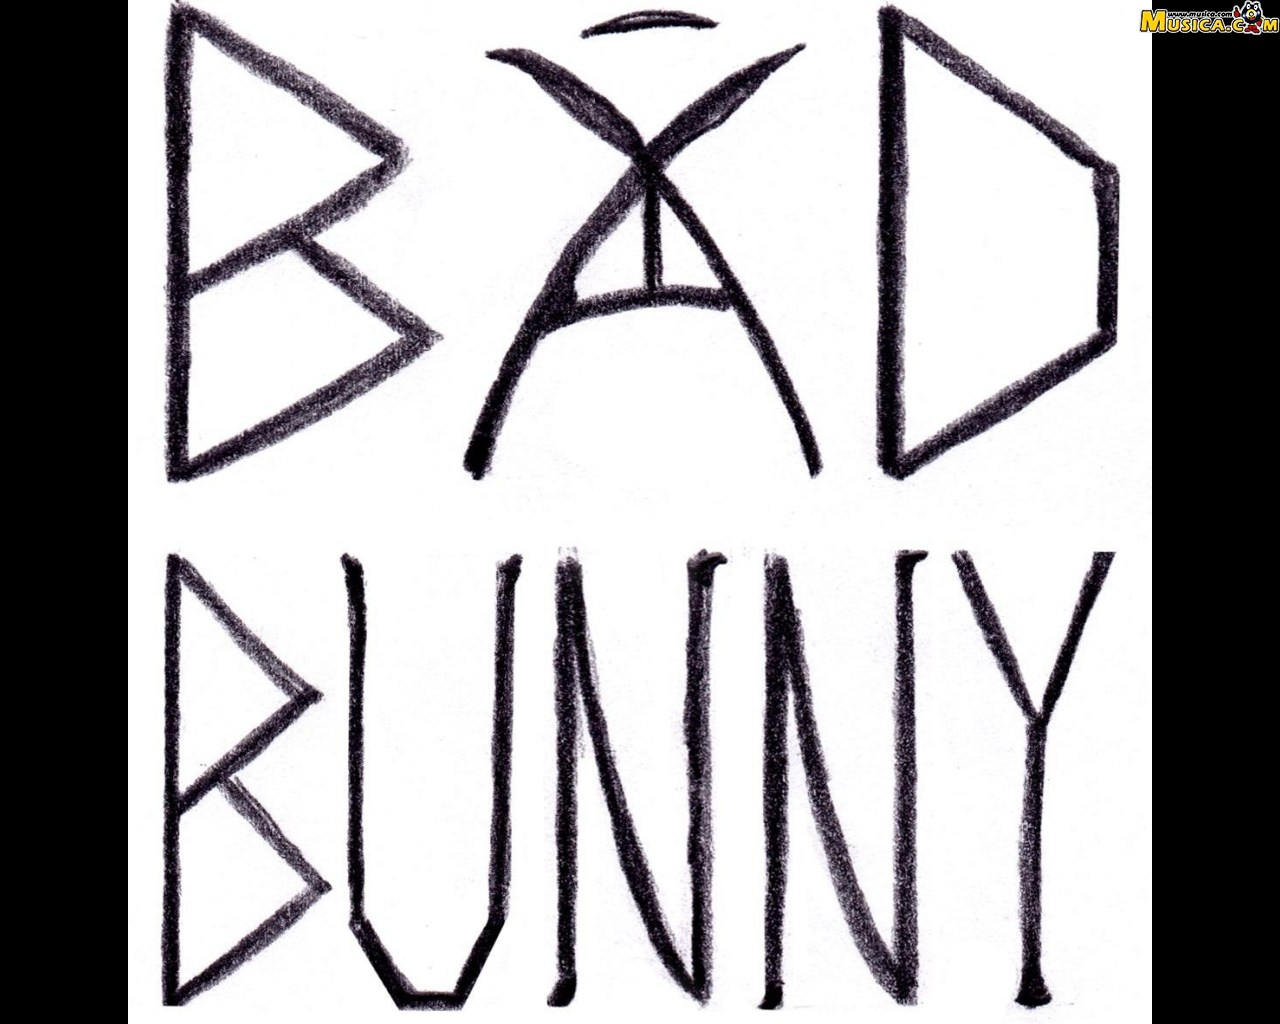 Fondo De Escritorio Bad Bunny  MUSICACOM